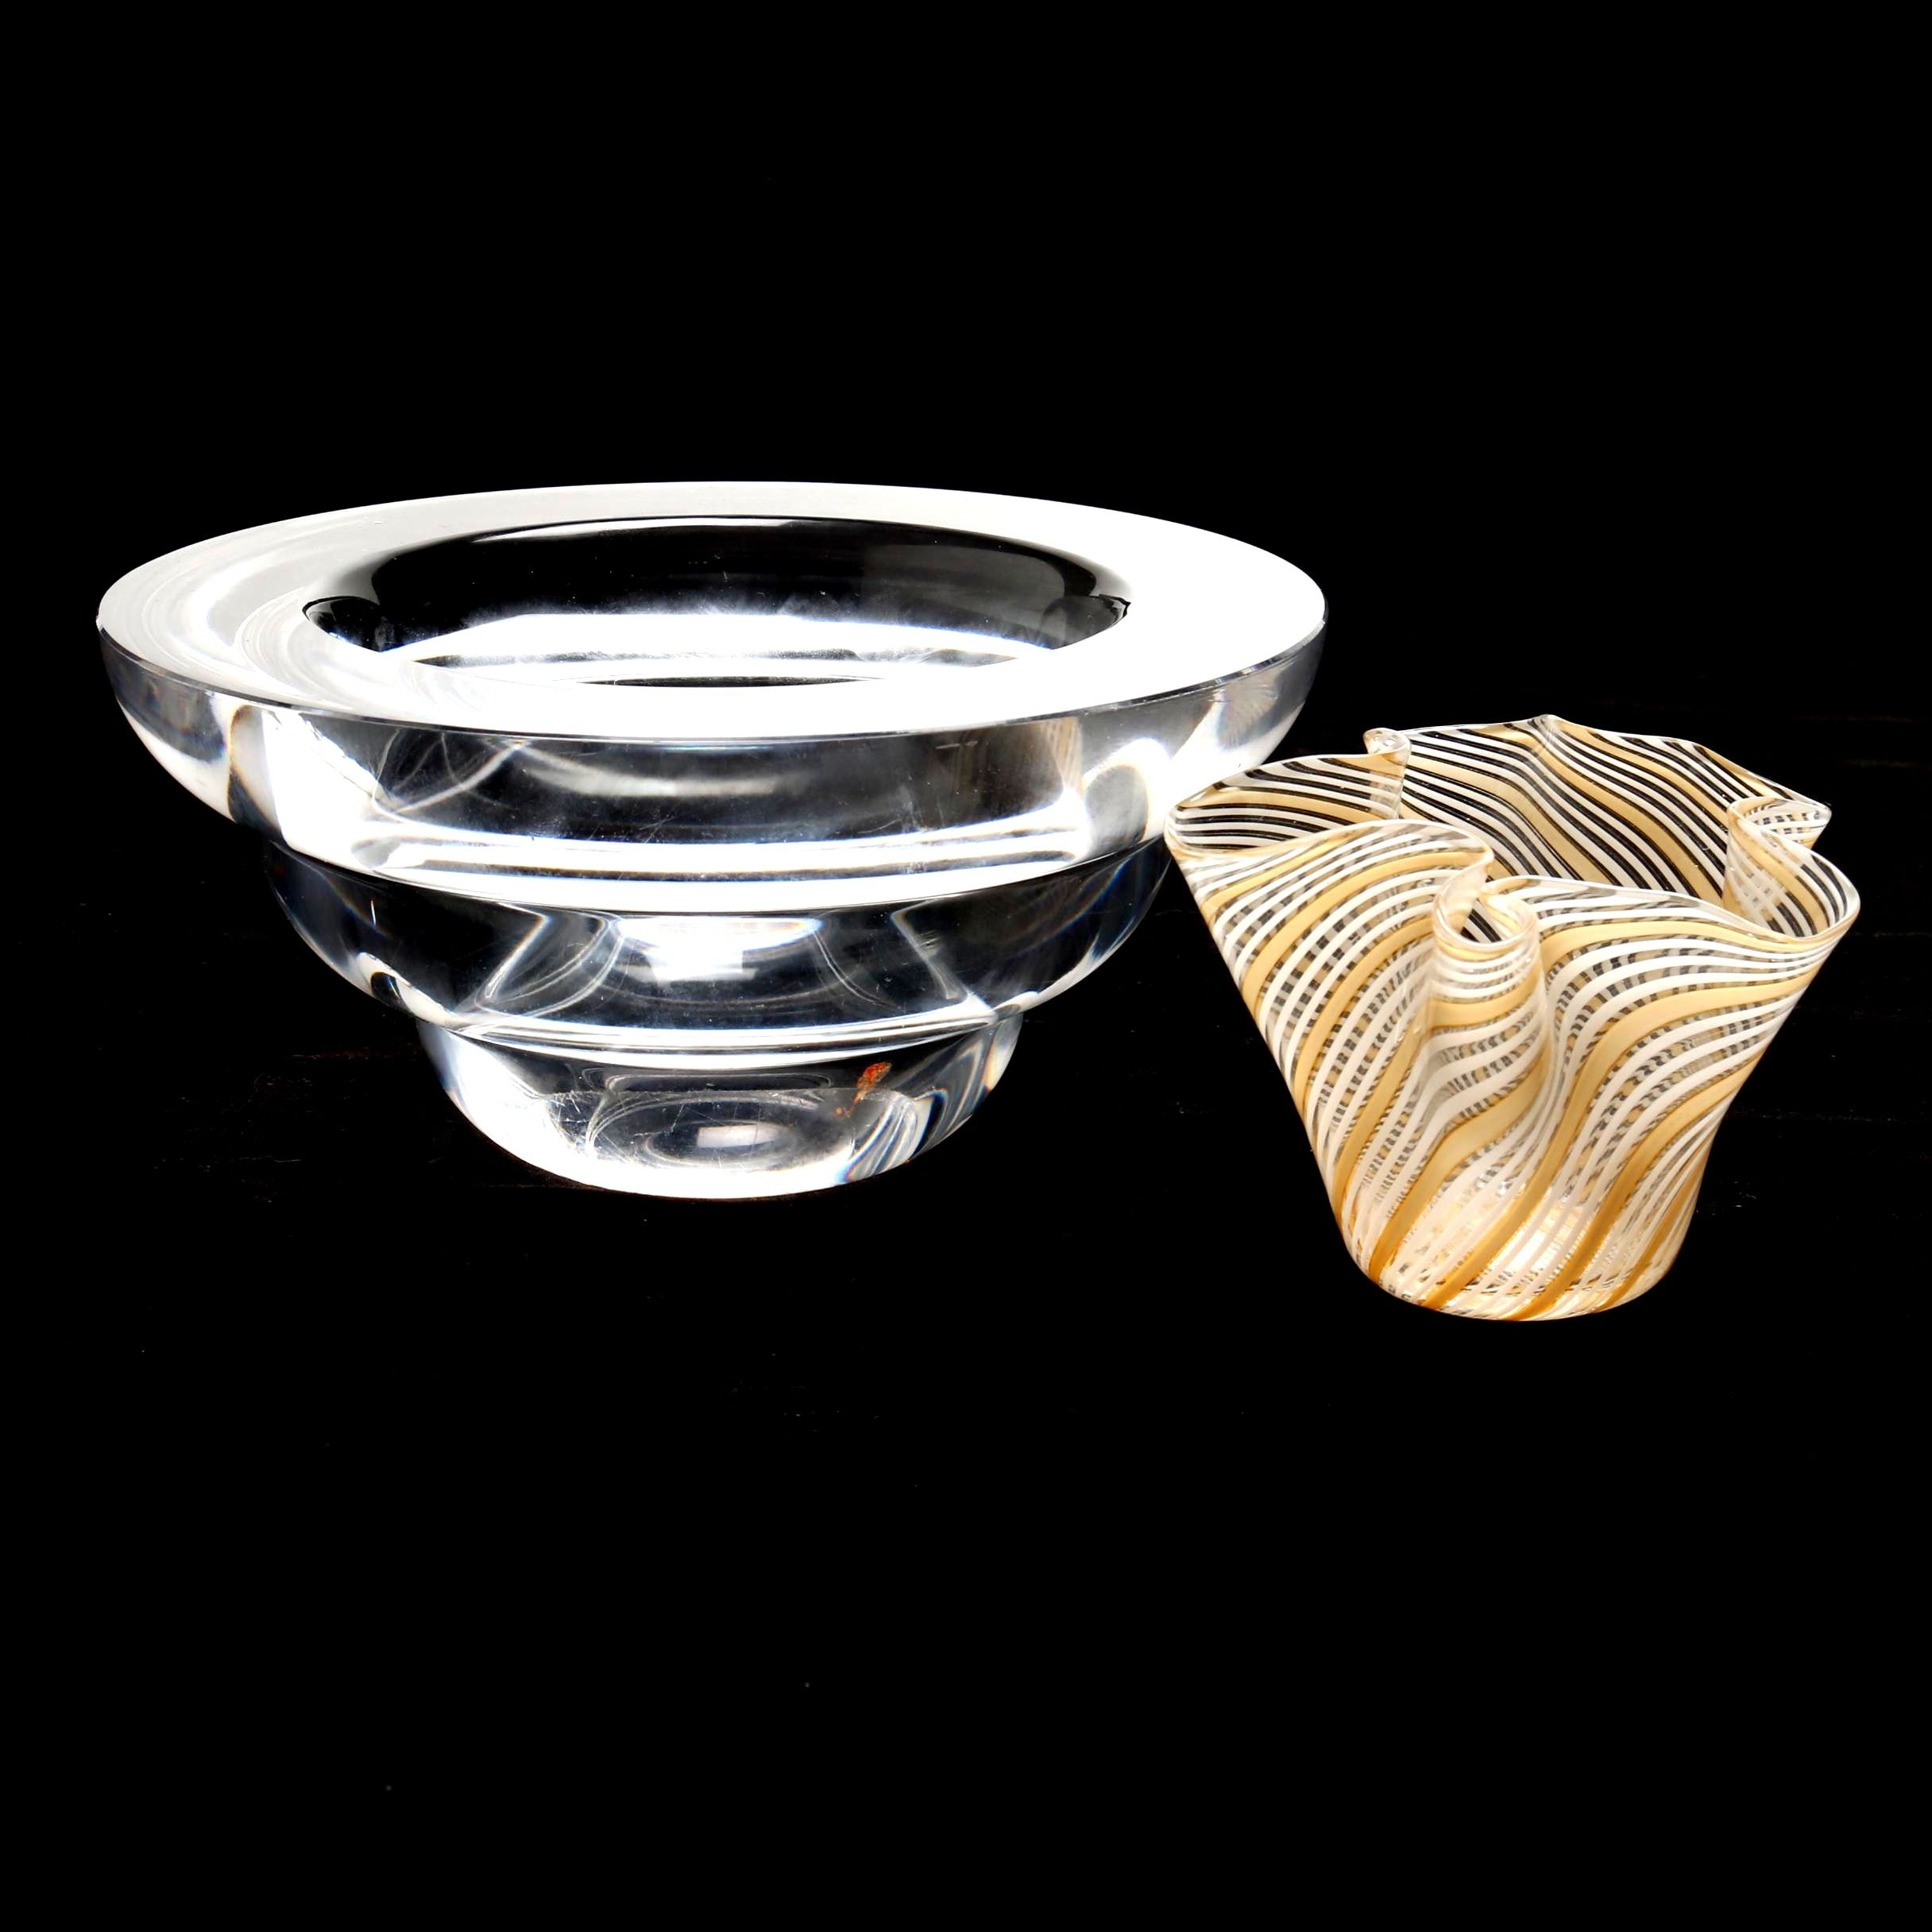 Kosta Boda Crystal Bowl with Striped Handkerchief Bowl